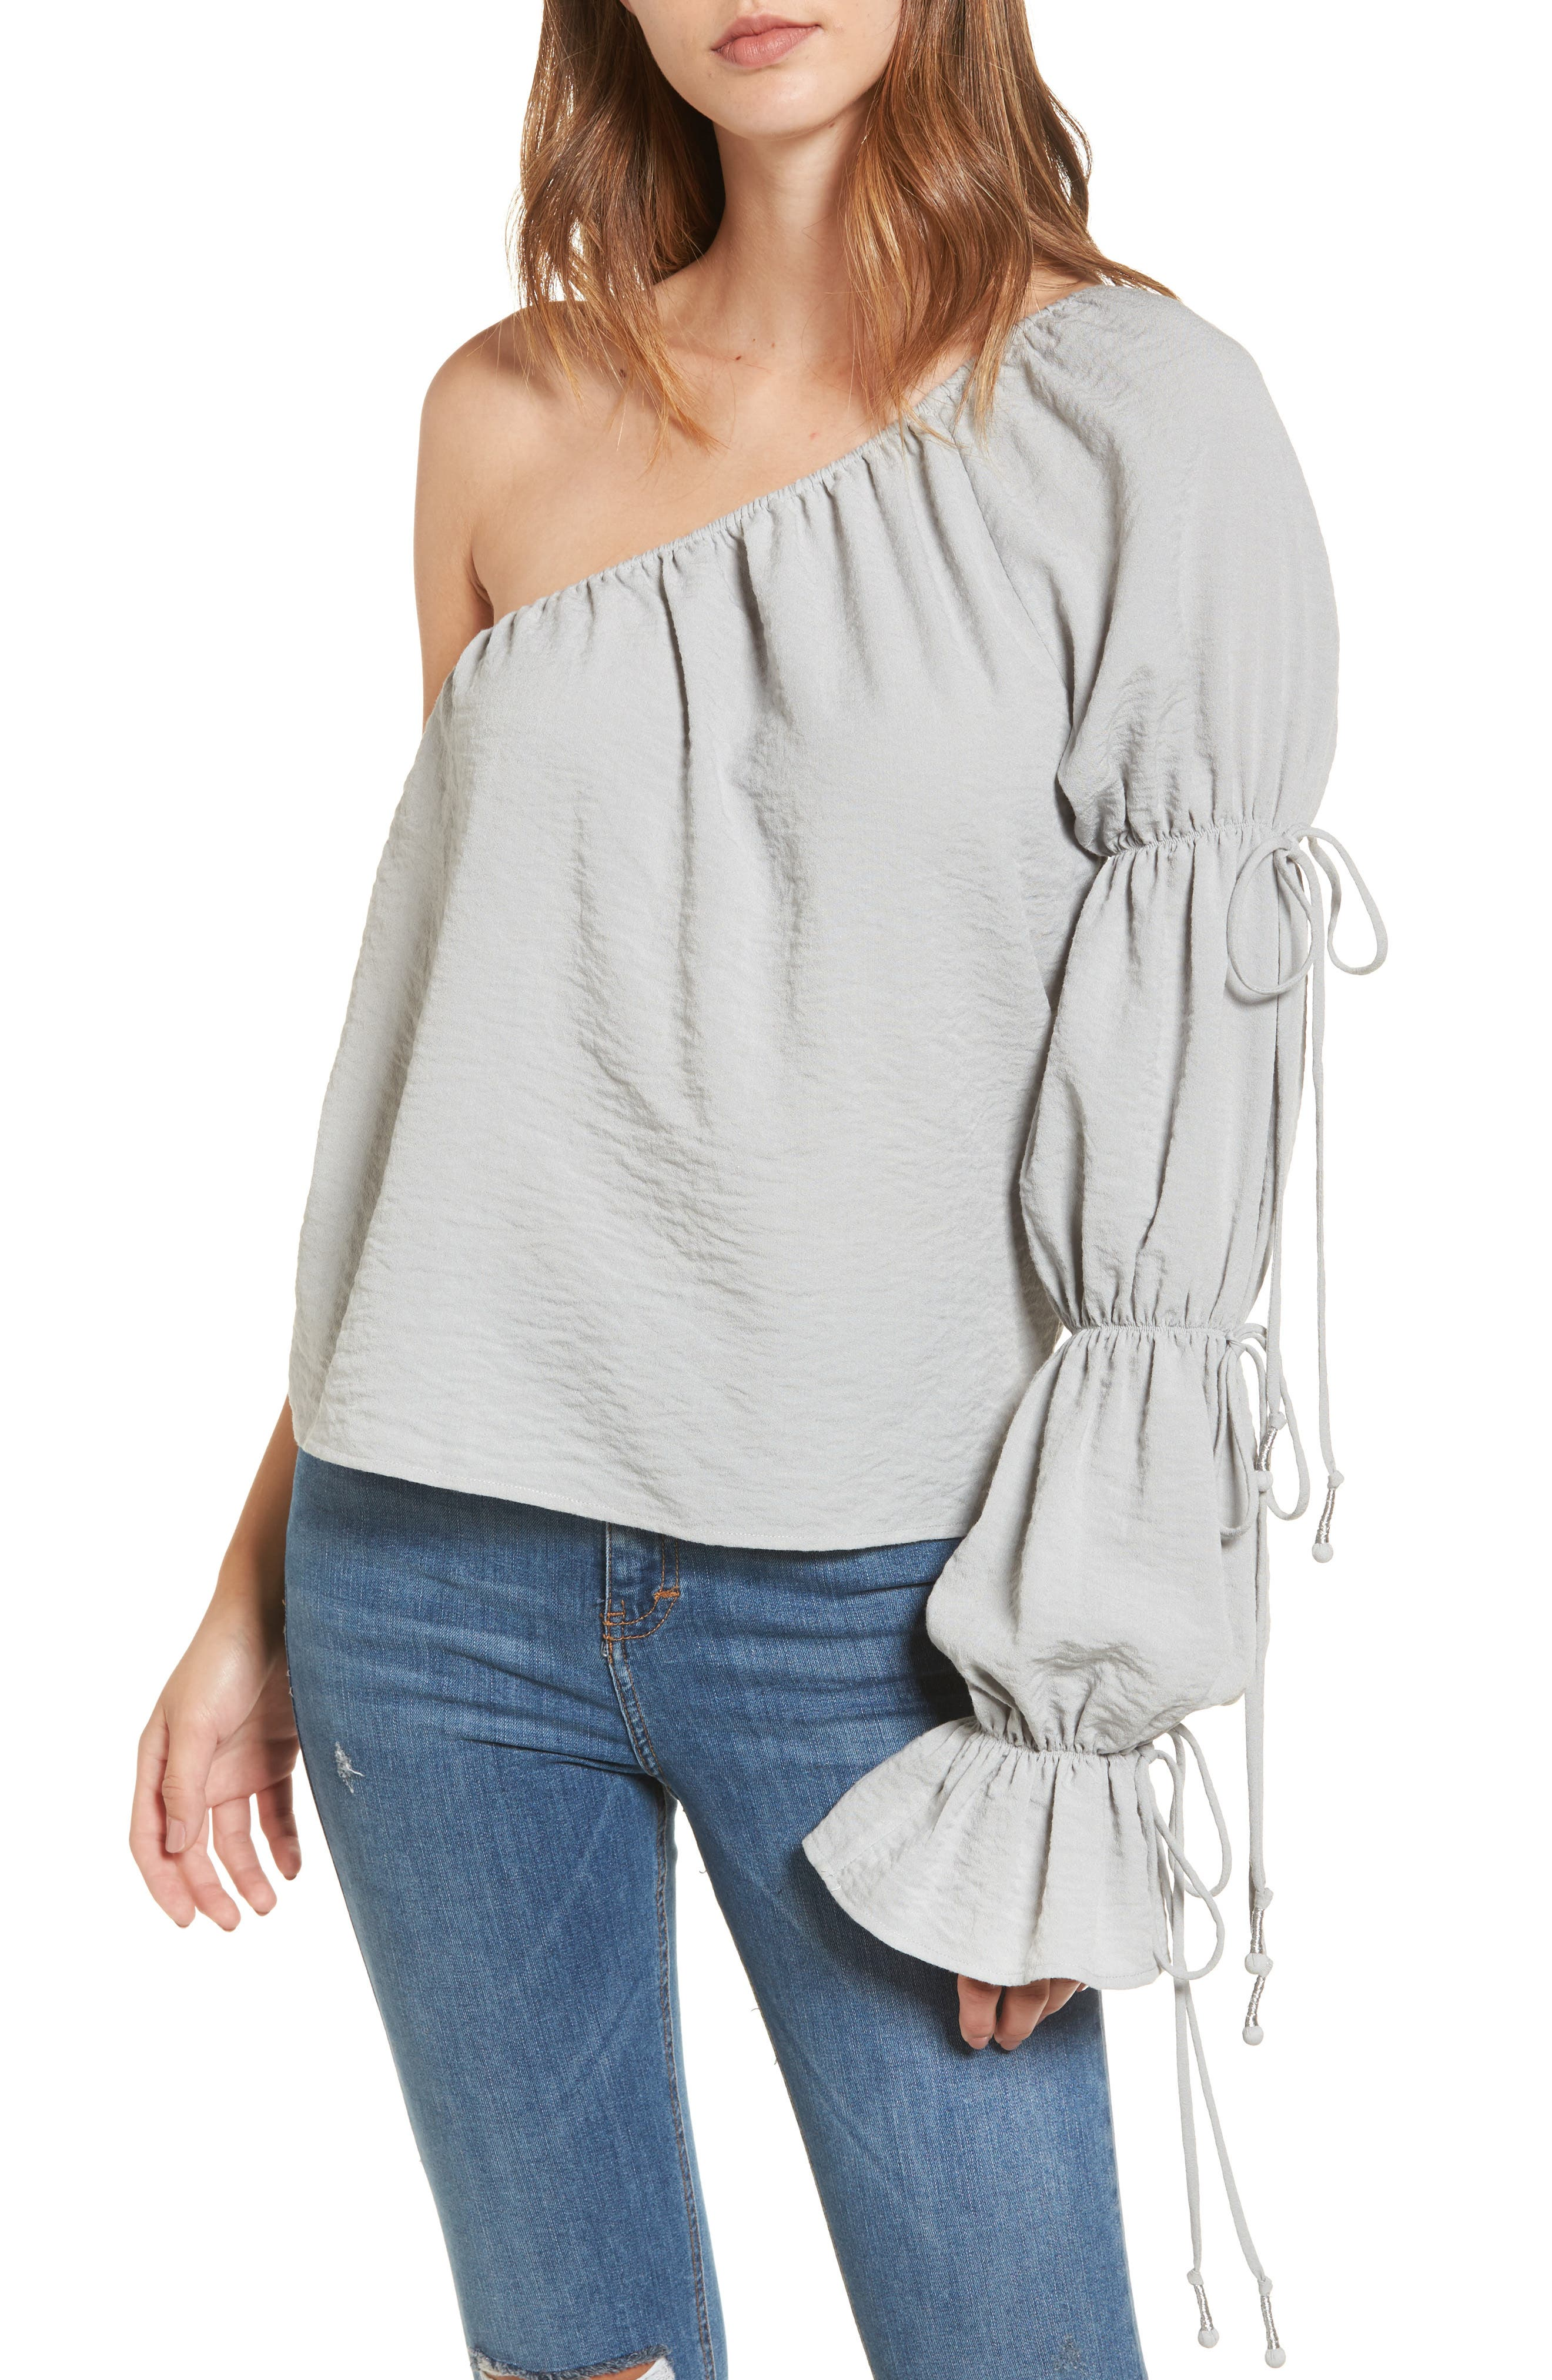 Main Image - Tularosa Gigi One-Shoulder Top